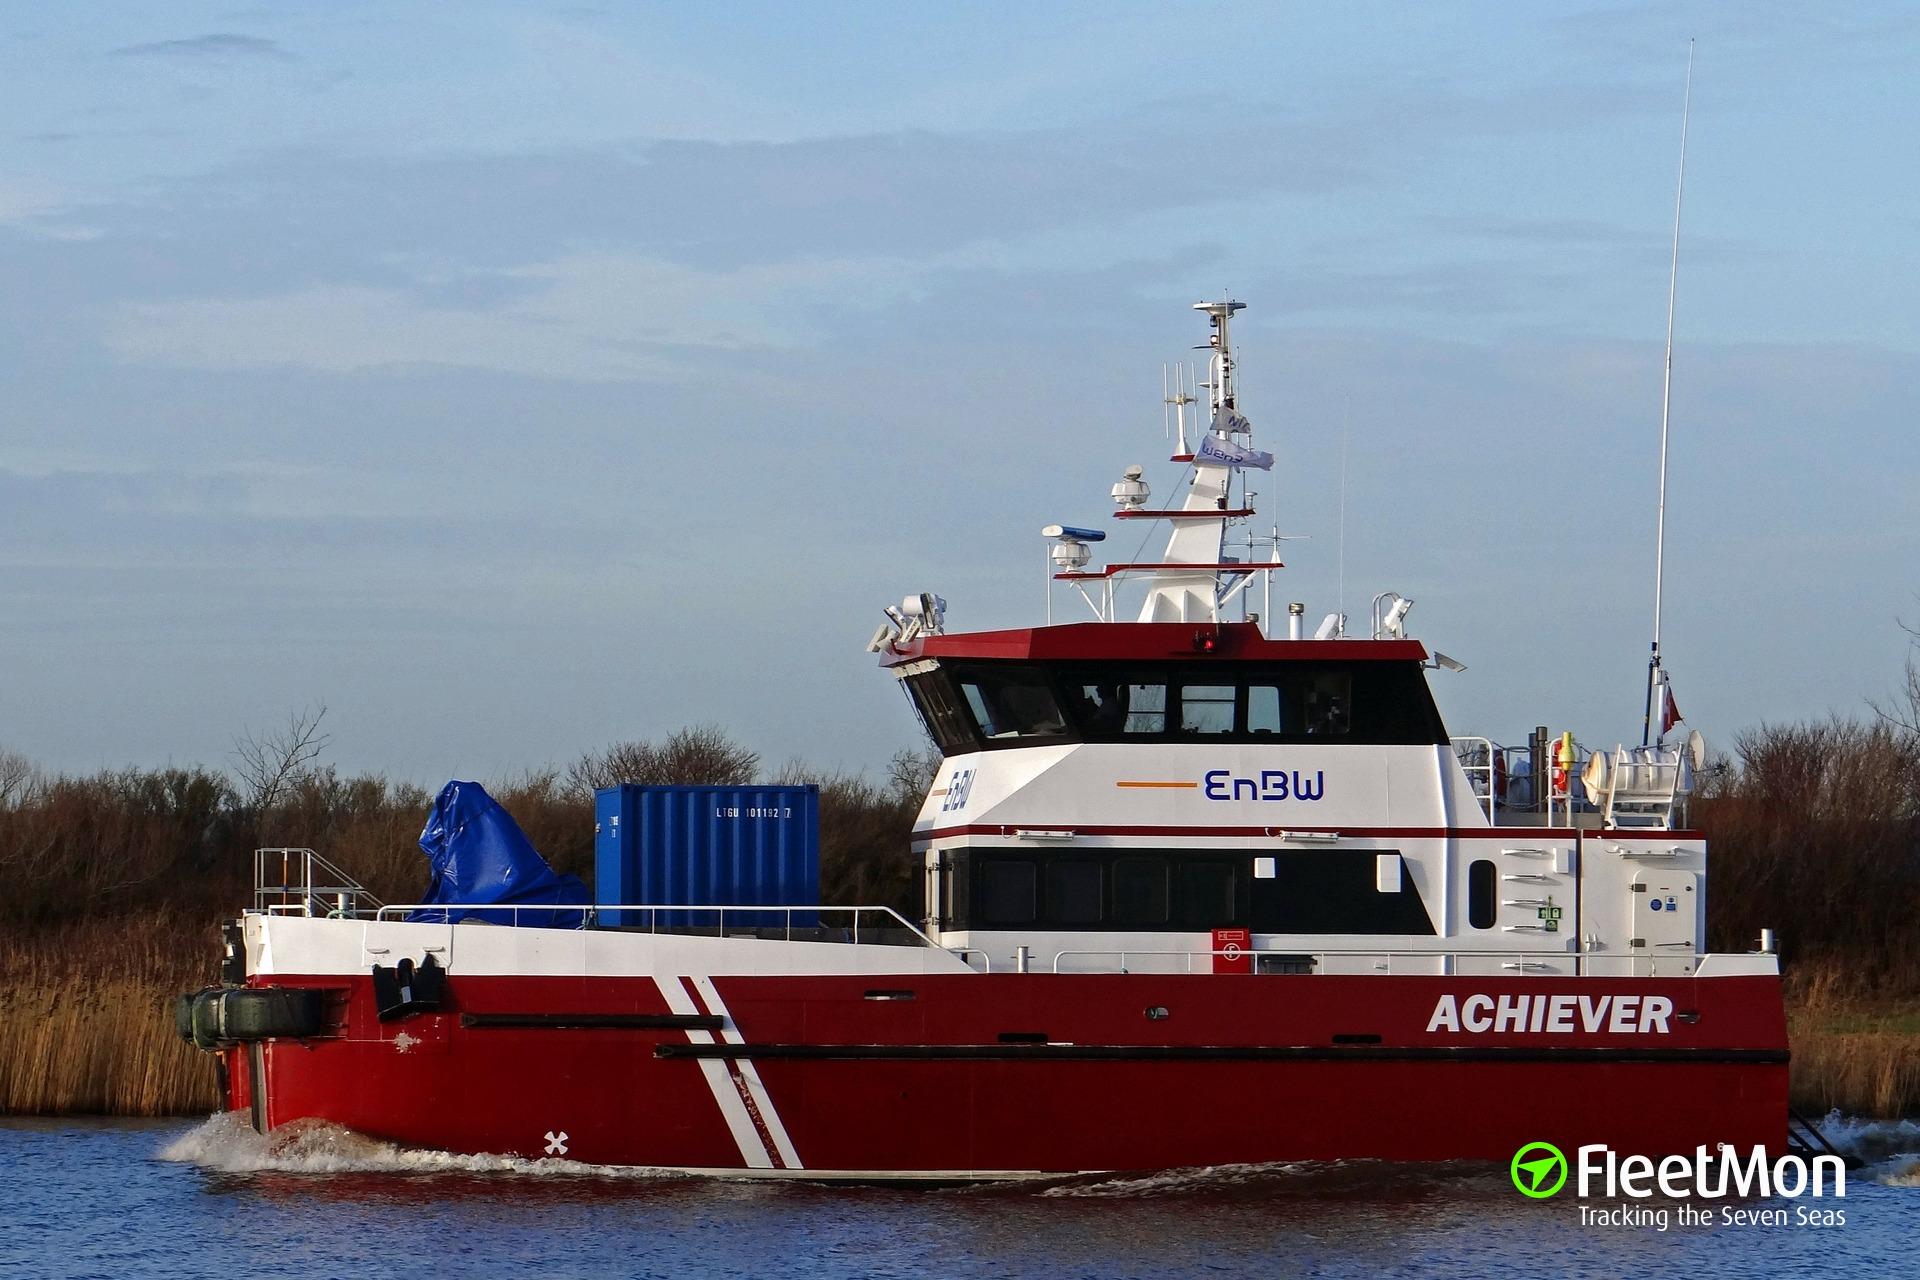 Danish service ship rammed two pleasure boats, Germany